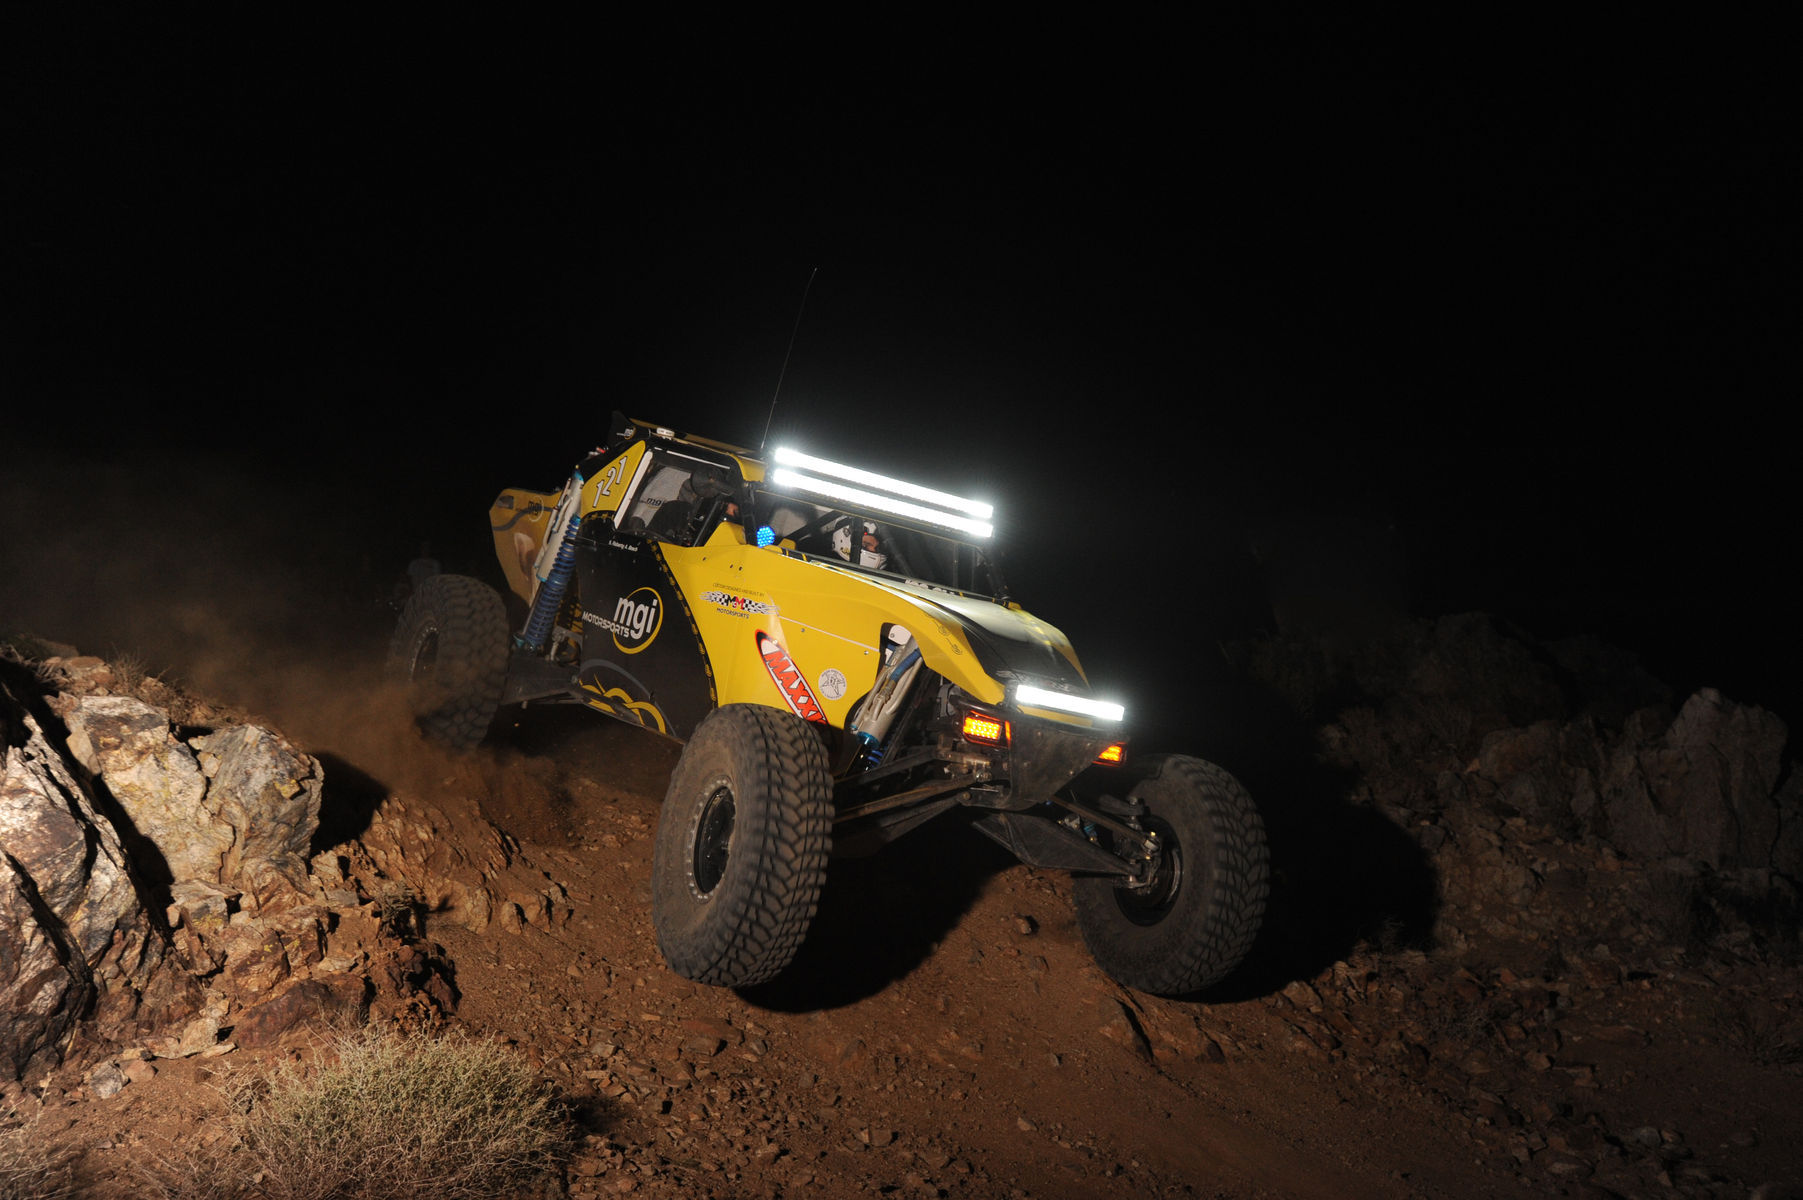 | Rigid Industries lights for maximum visibility!